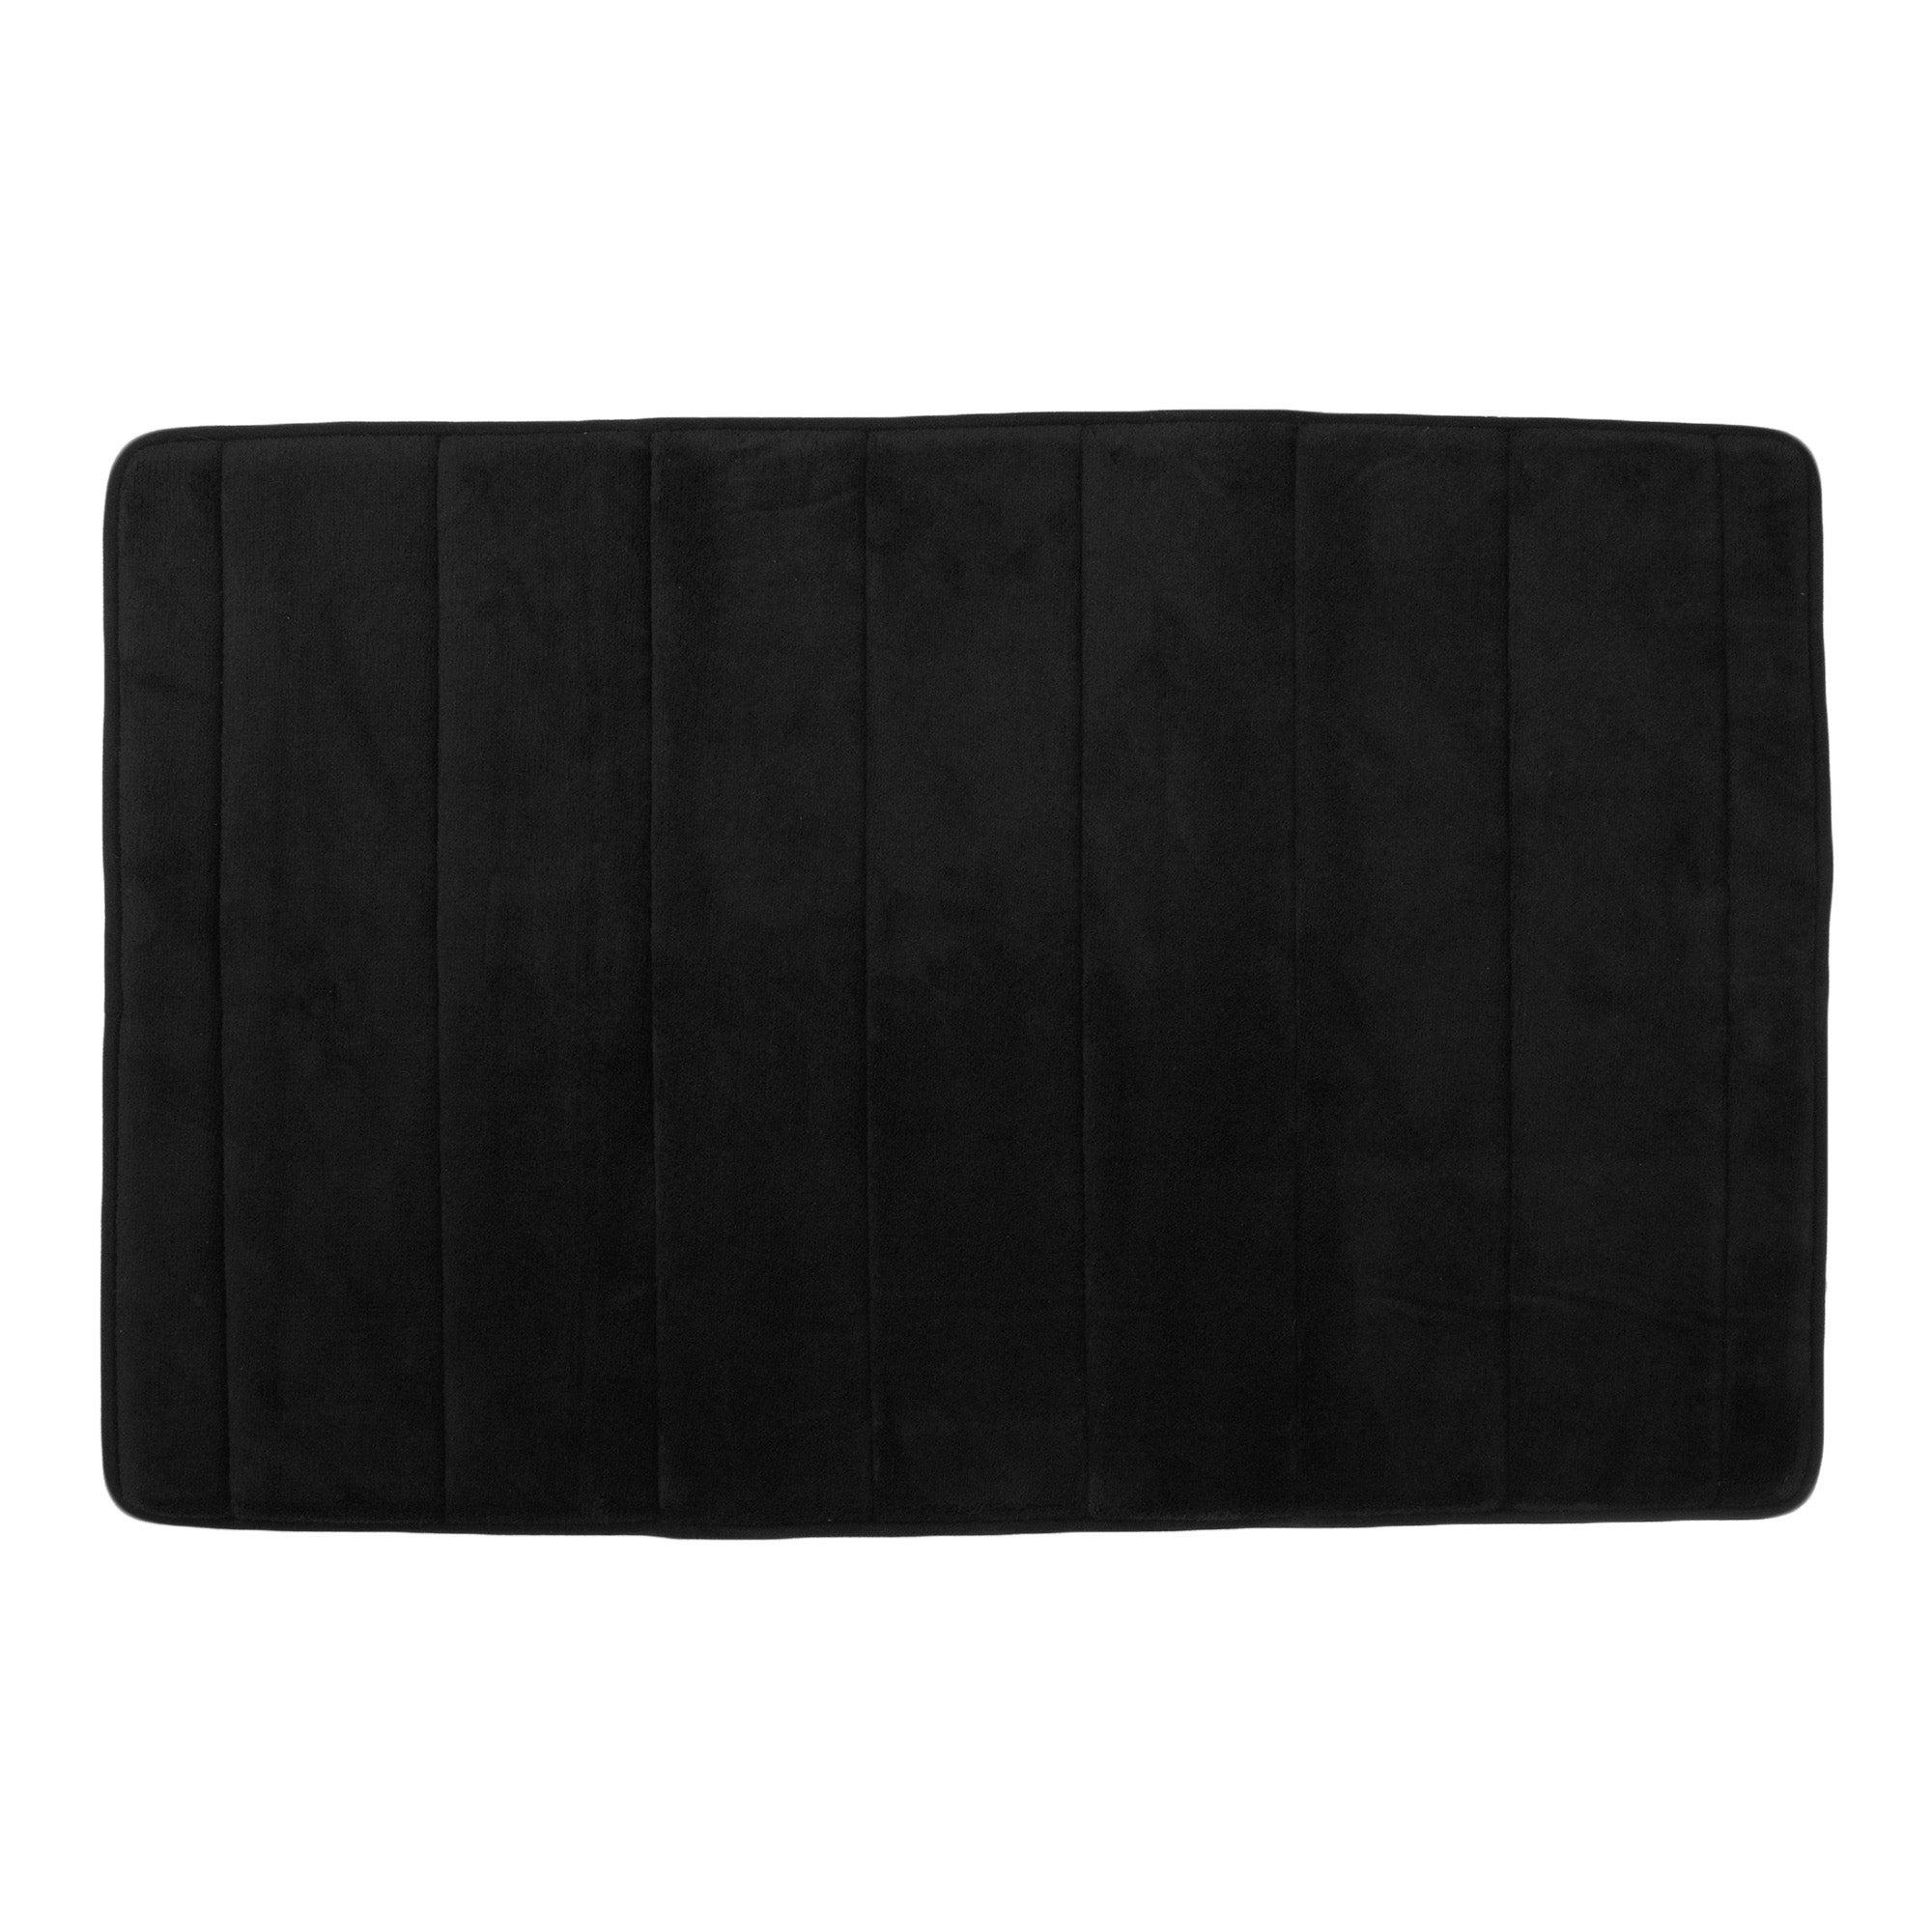 Photo of Memory foam bath mat black